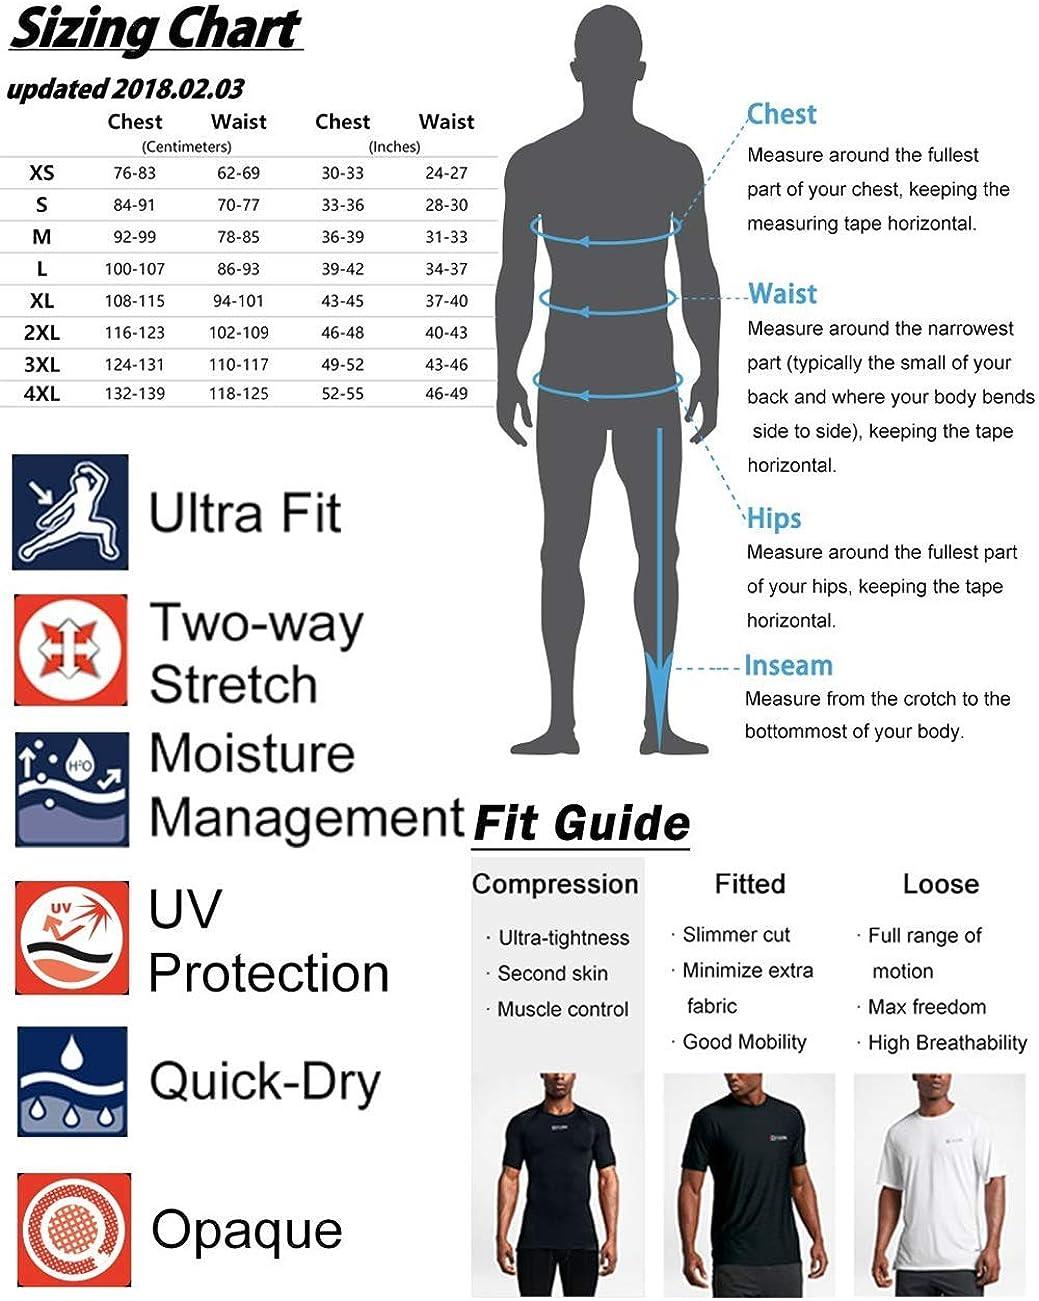 SNOW DREAMS Mens Long Sleeve Rush Guard UV Sun Protection Top Shirts Quick Dry Stretchy